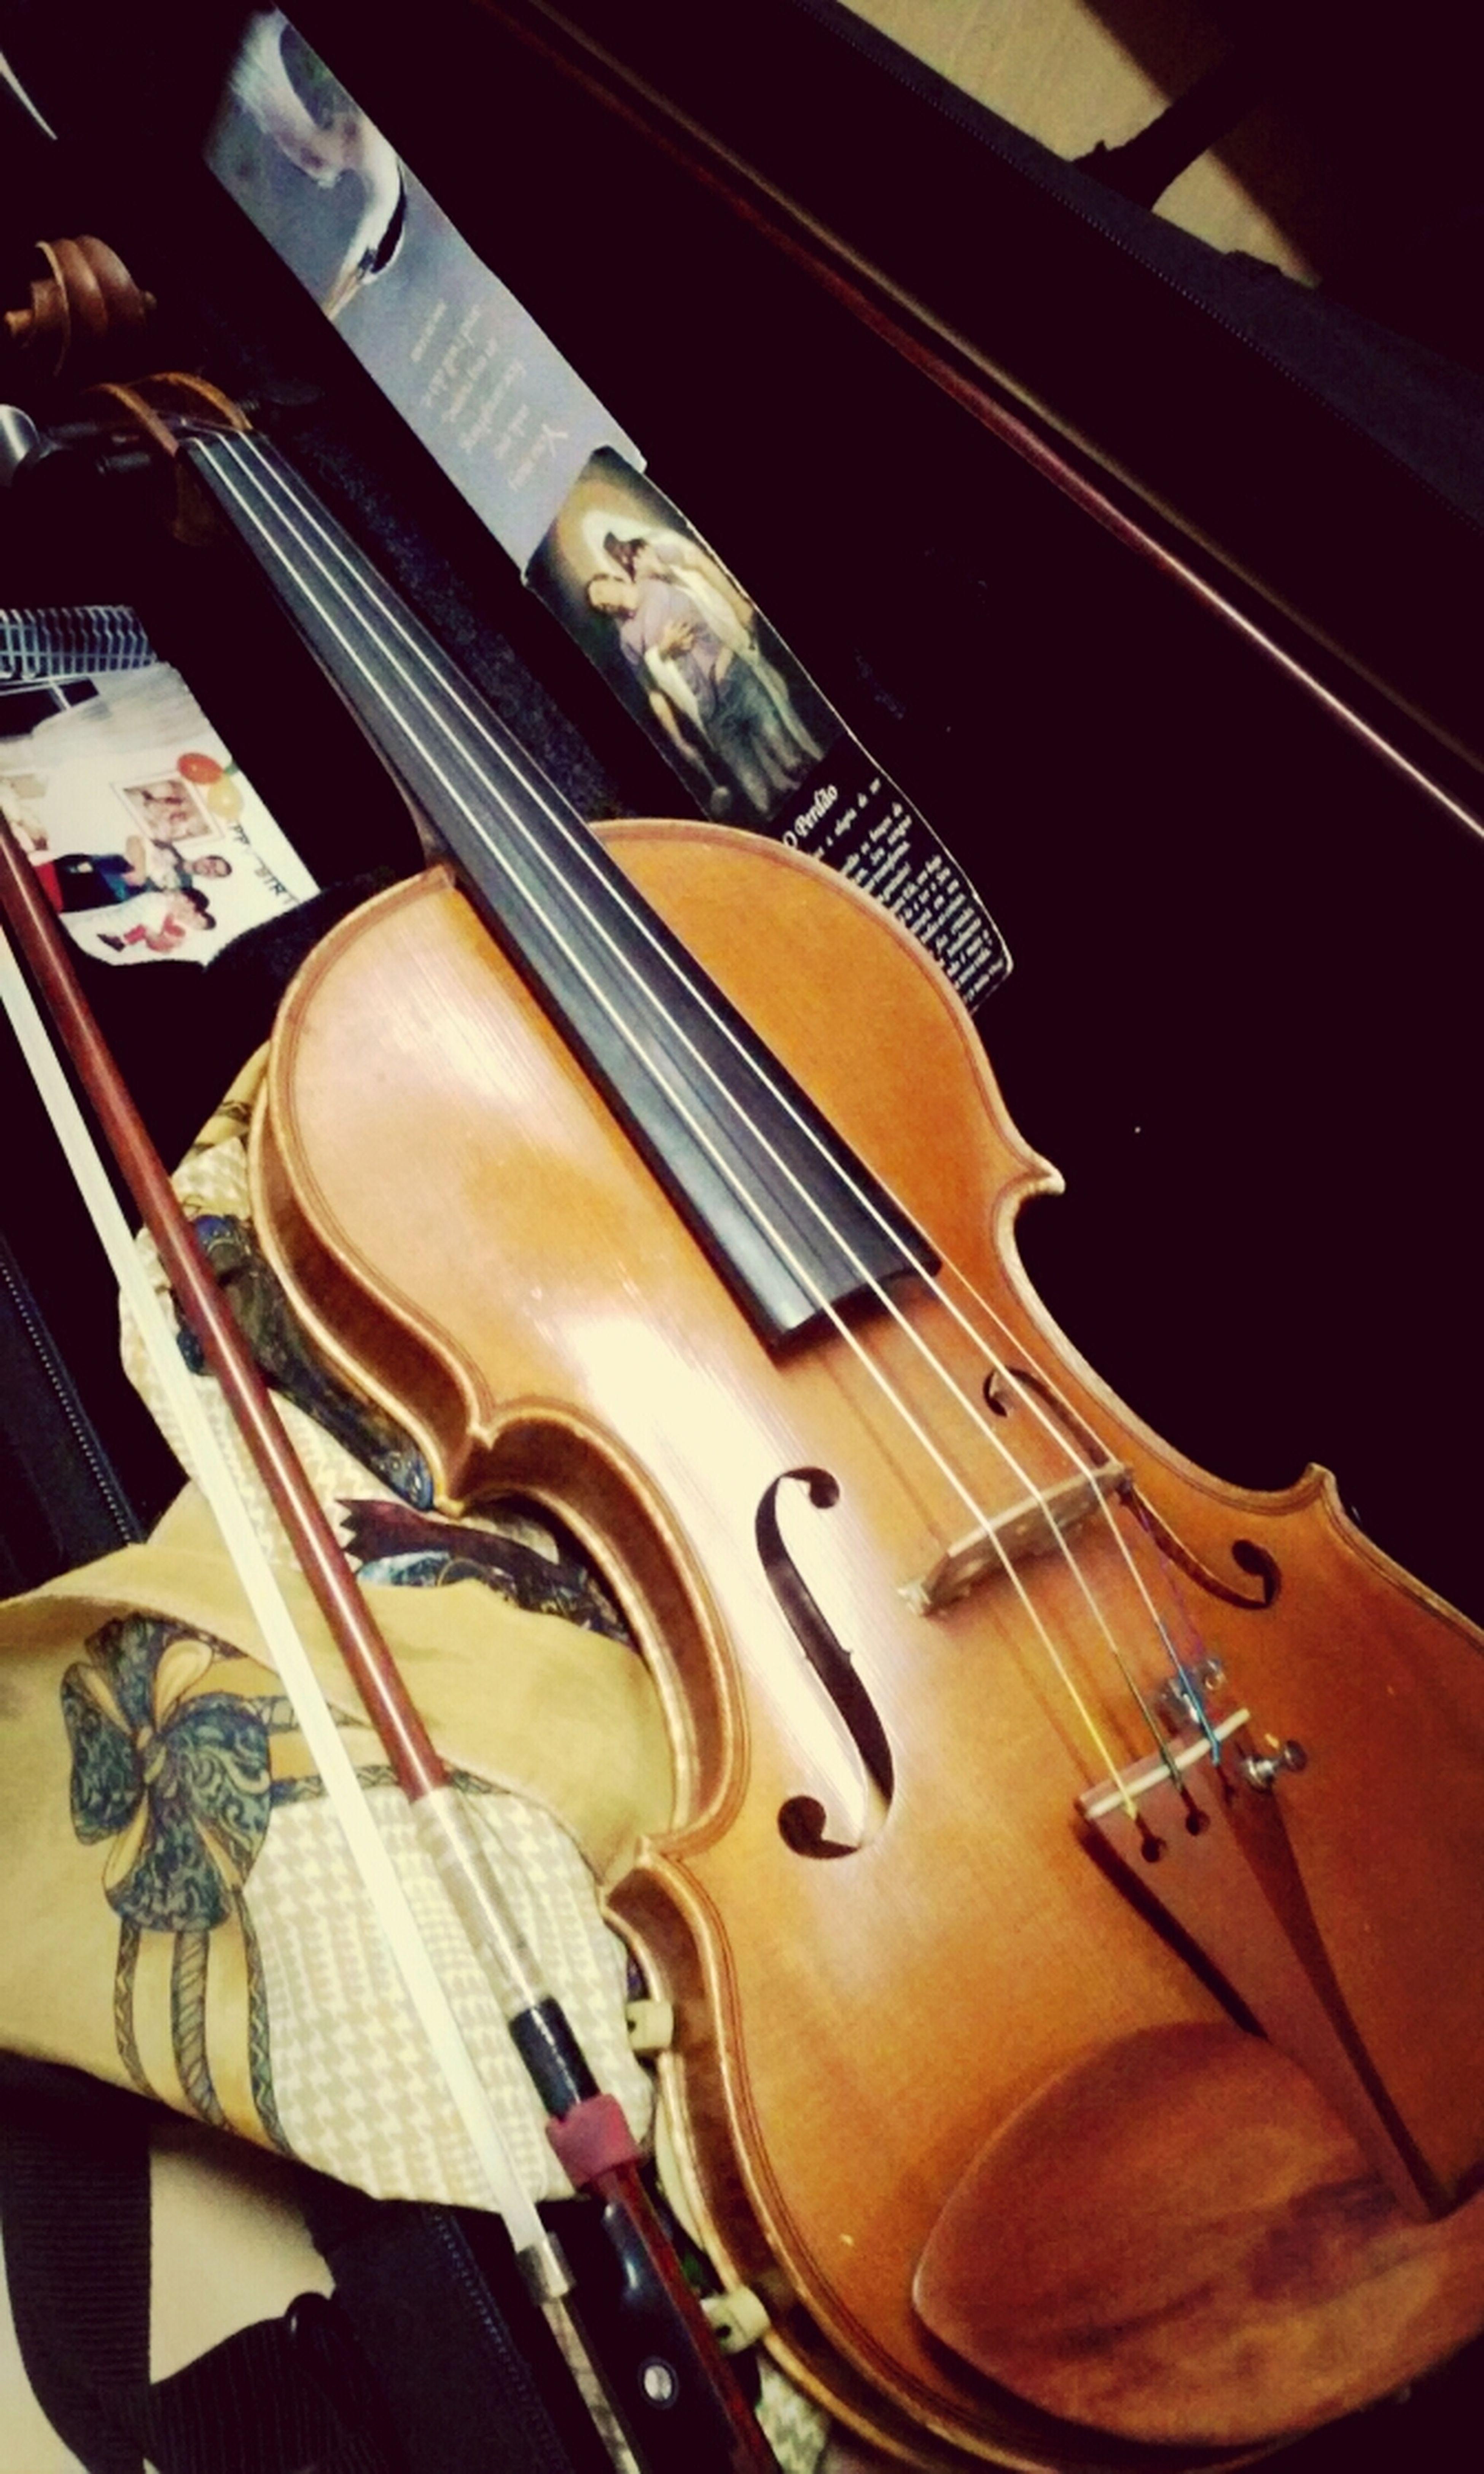 Studying Violin Music